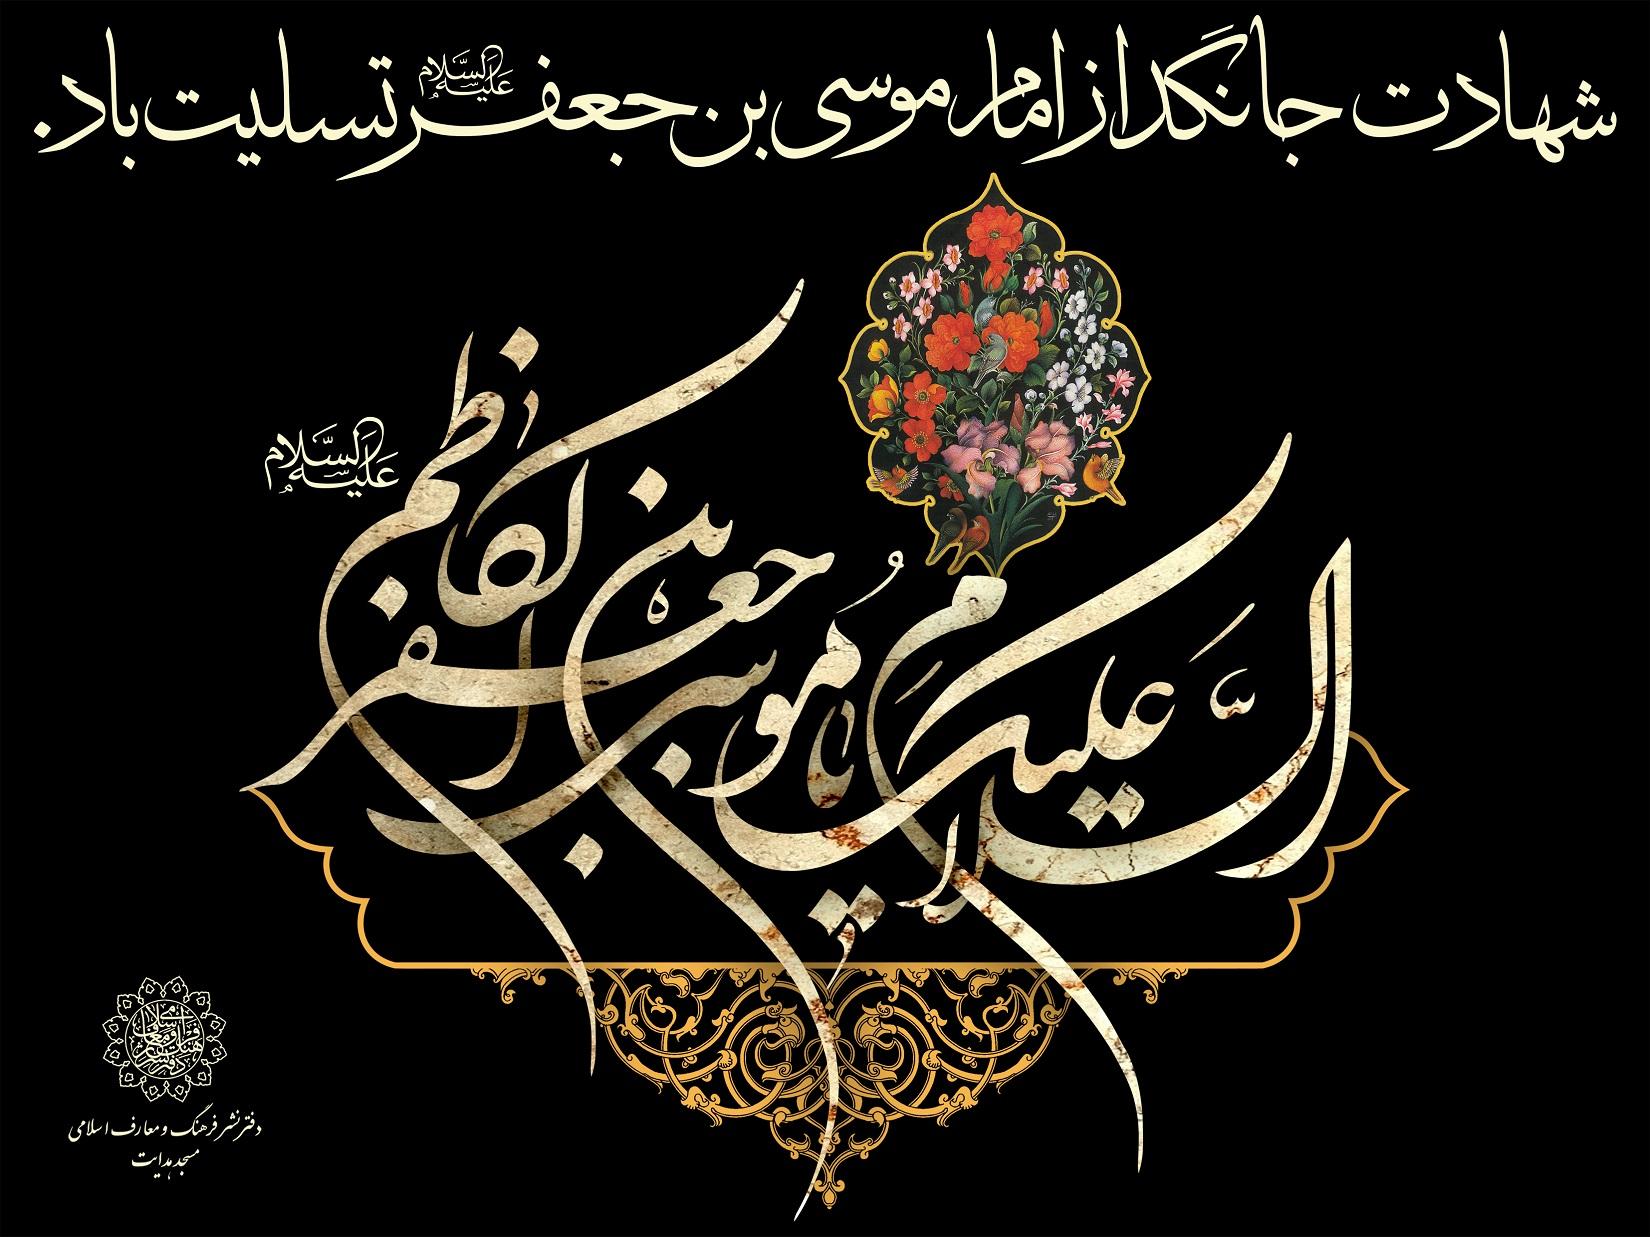 عکس شهادت امام کاظم(ع)